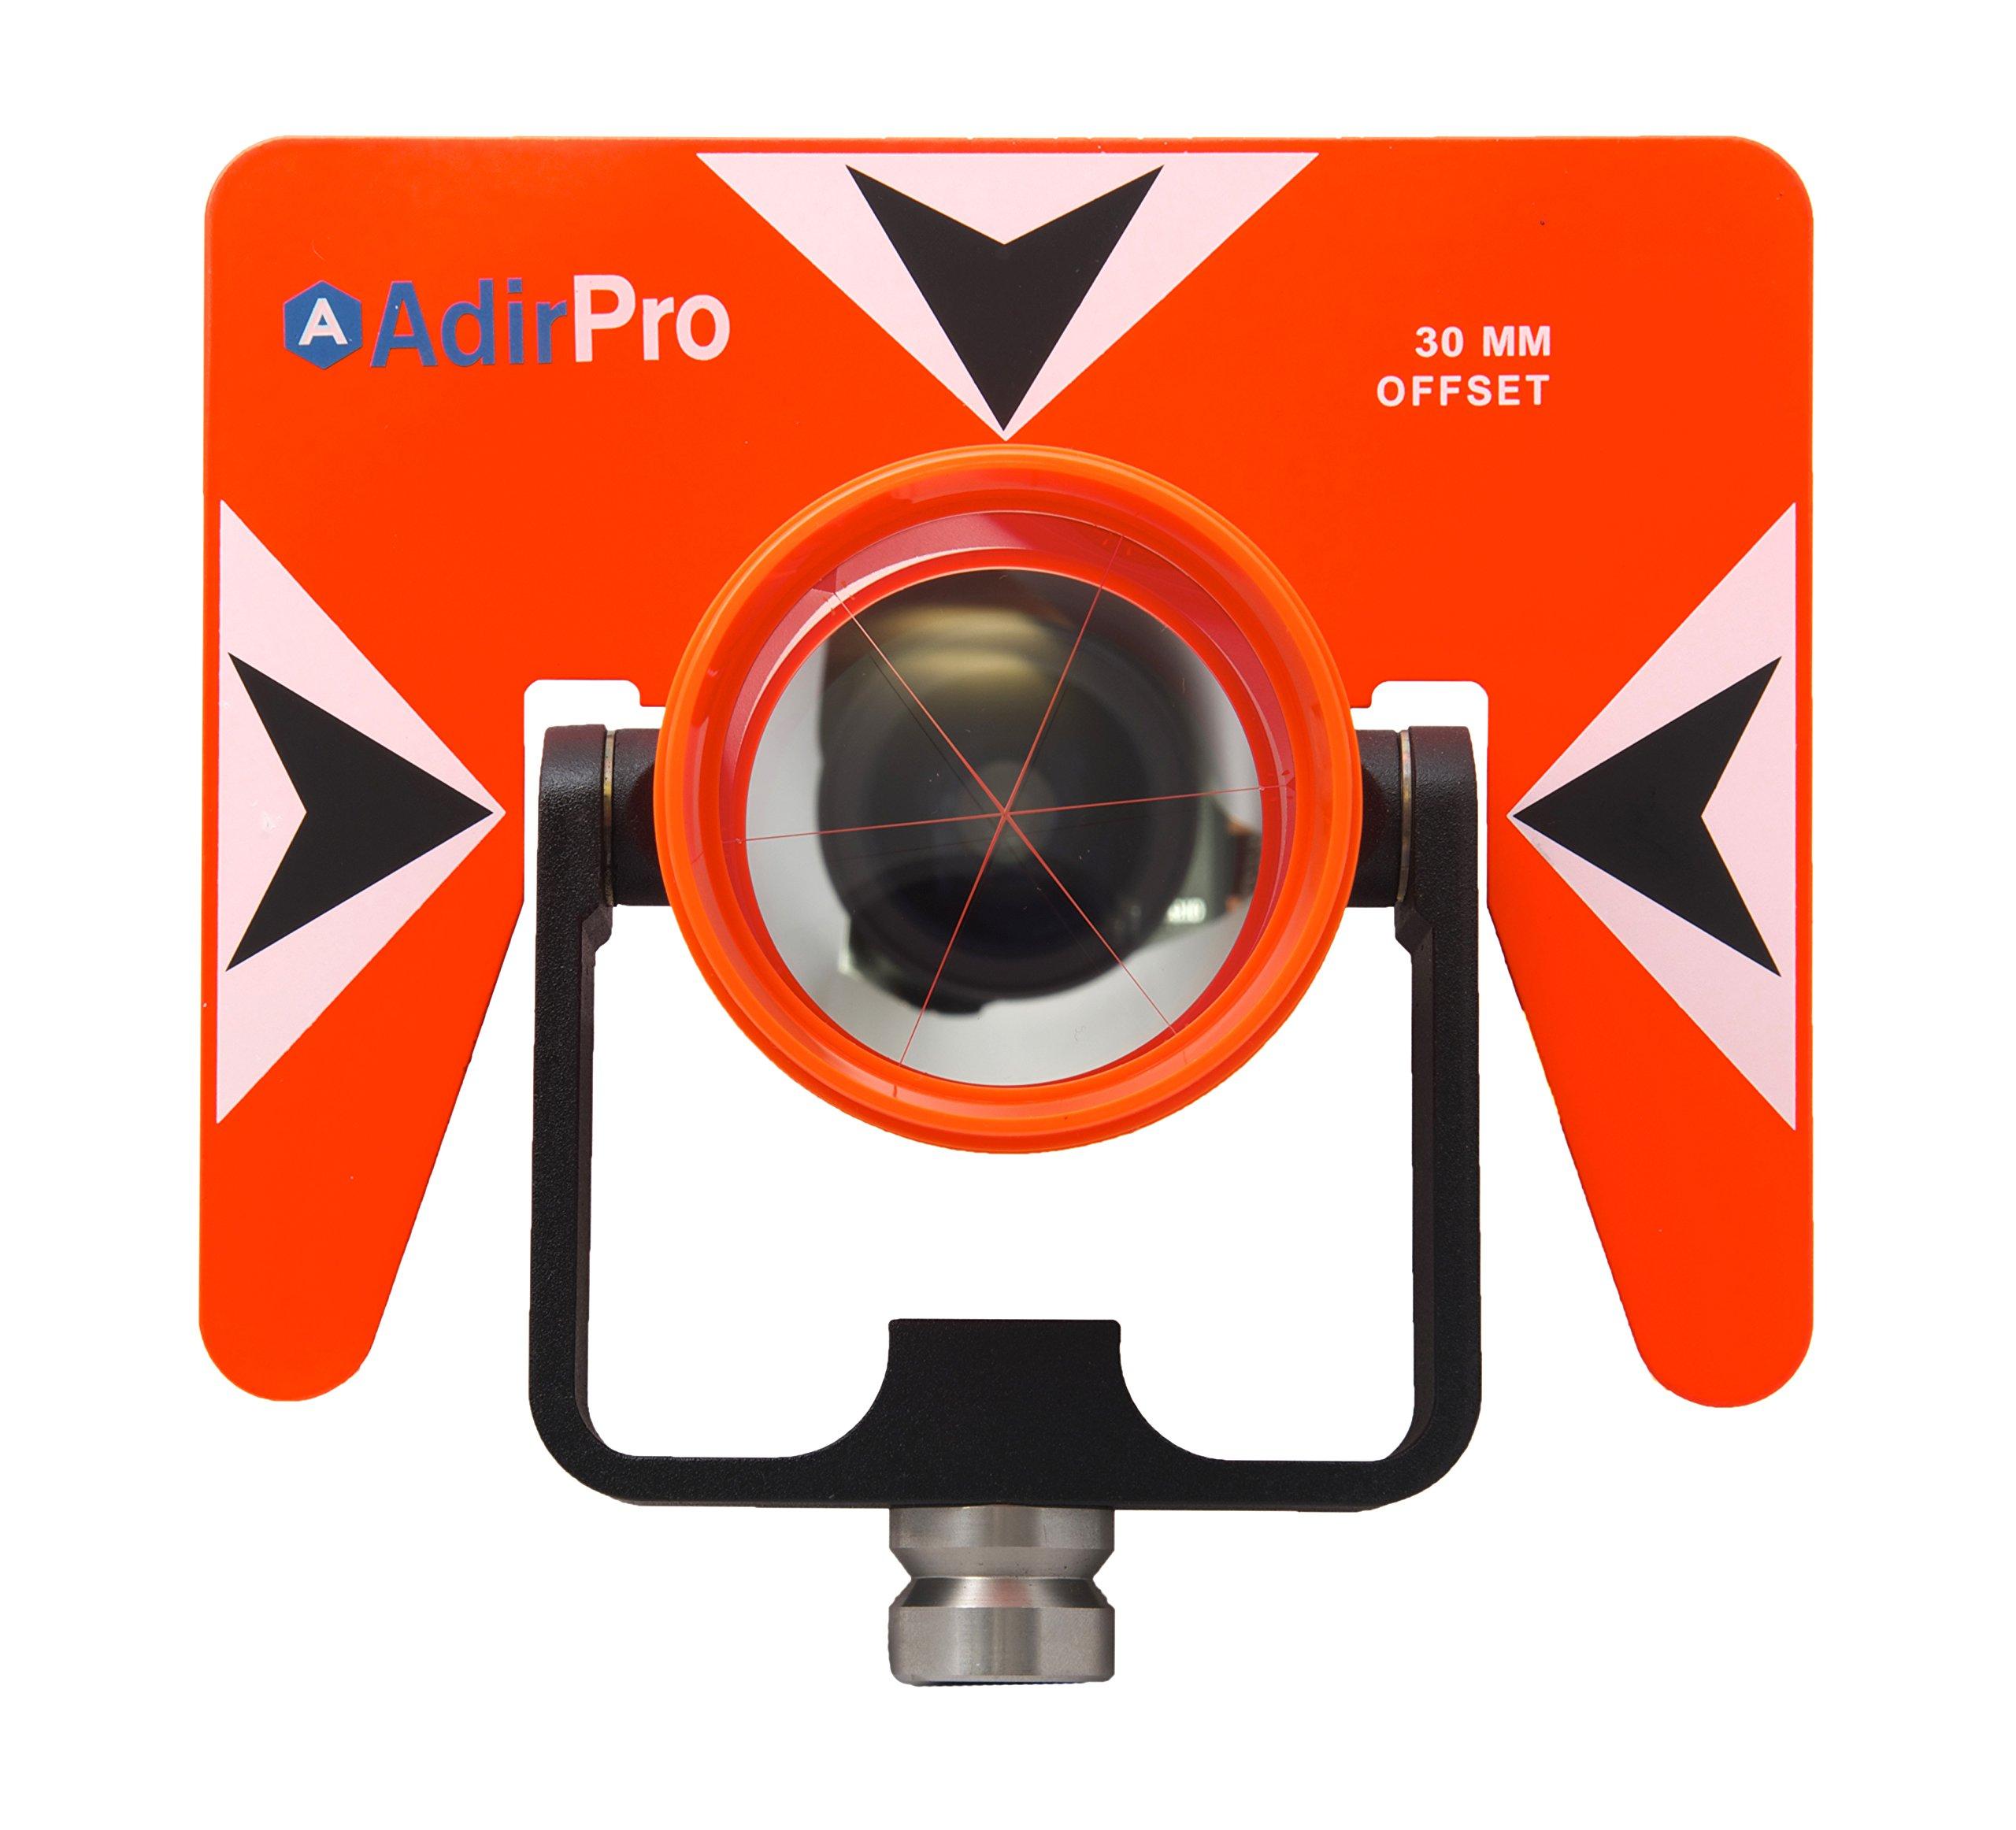 AdirPro All-Metal Single Tilt Prism 720-07 With Case